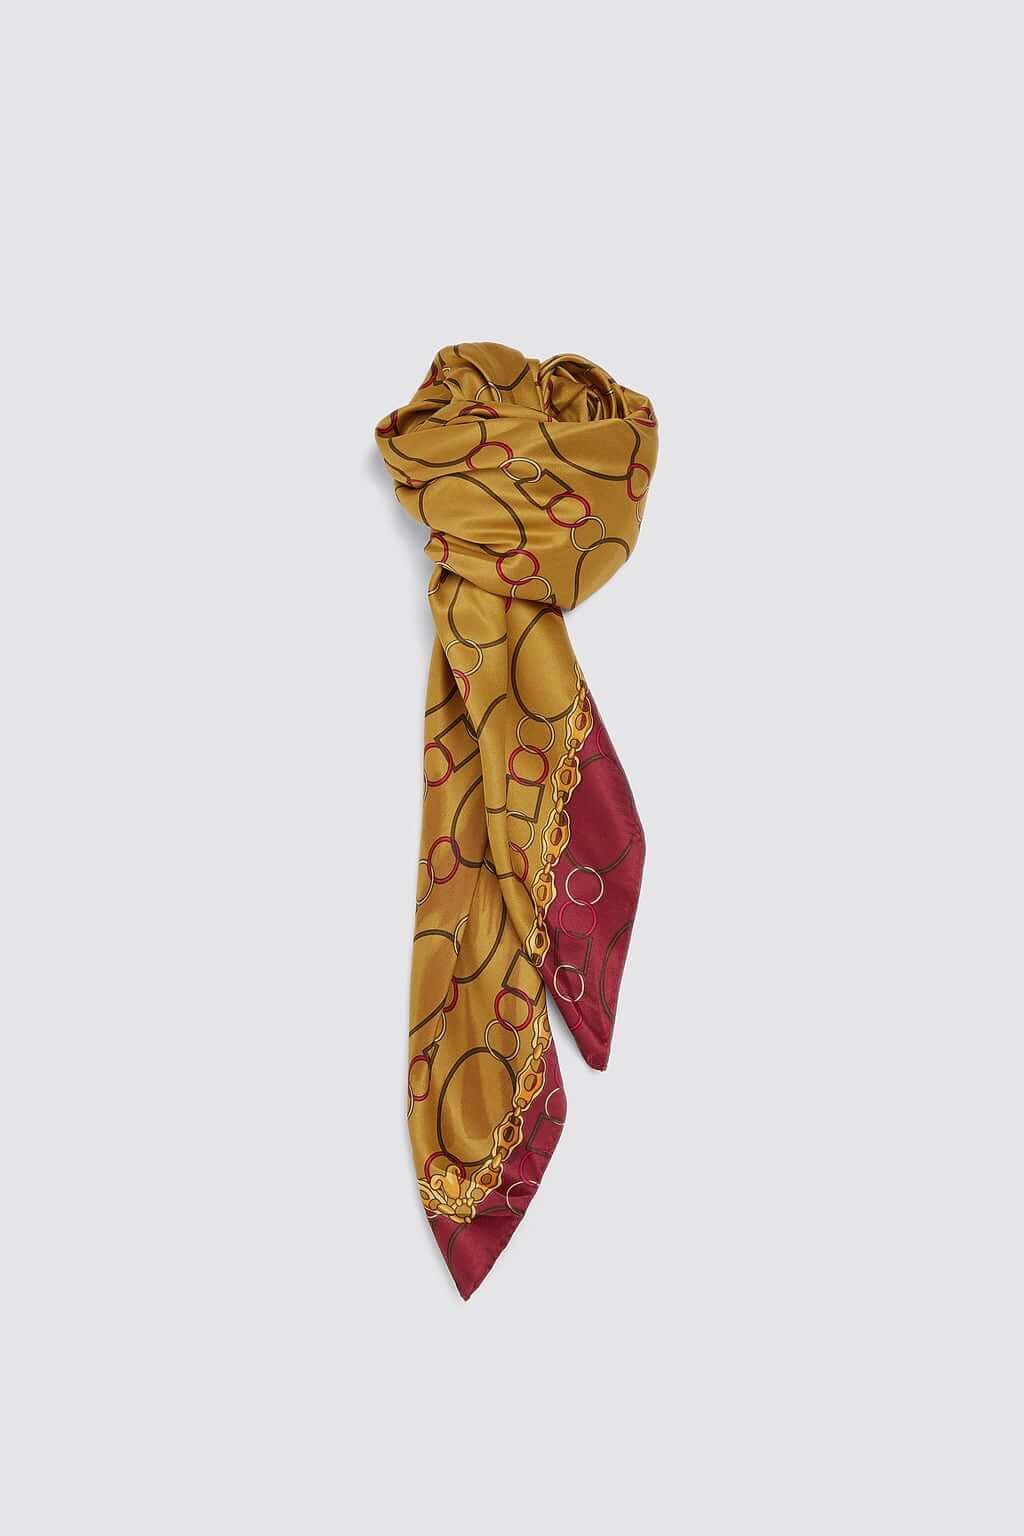 Zara chain scarf